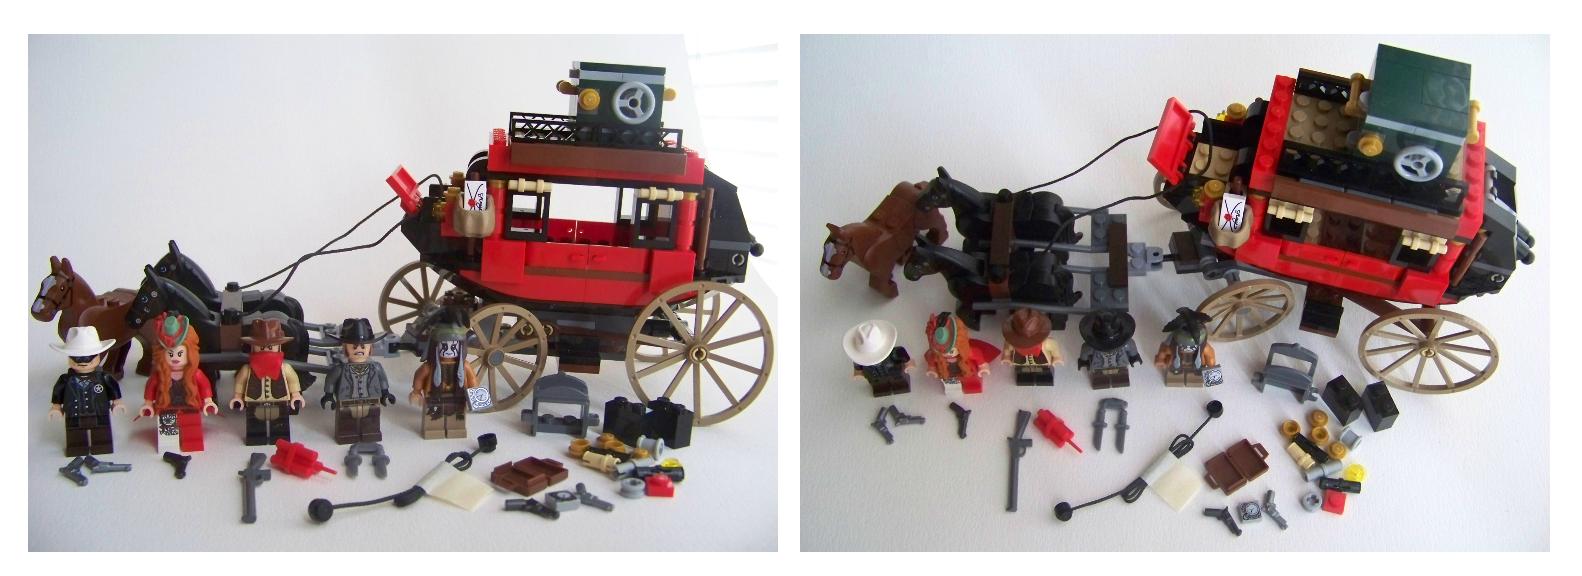 Stagecoach Escape | LEGO Shop